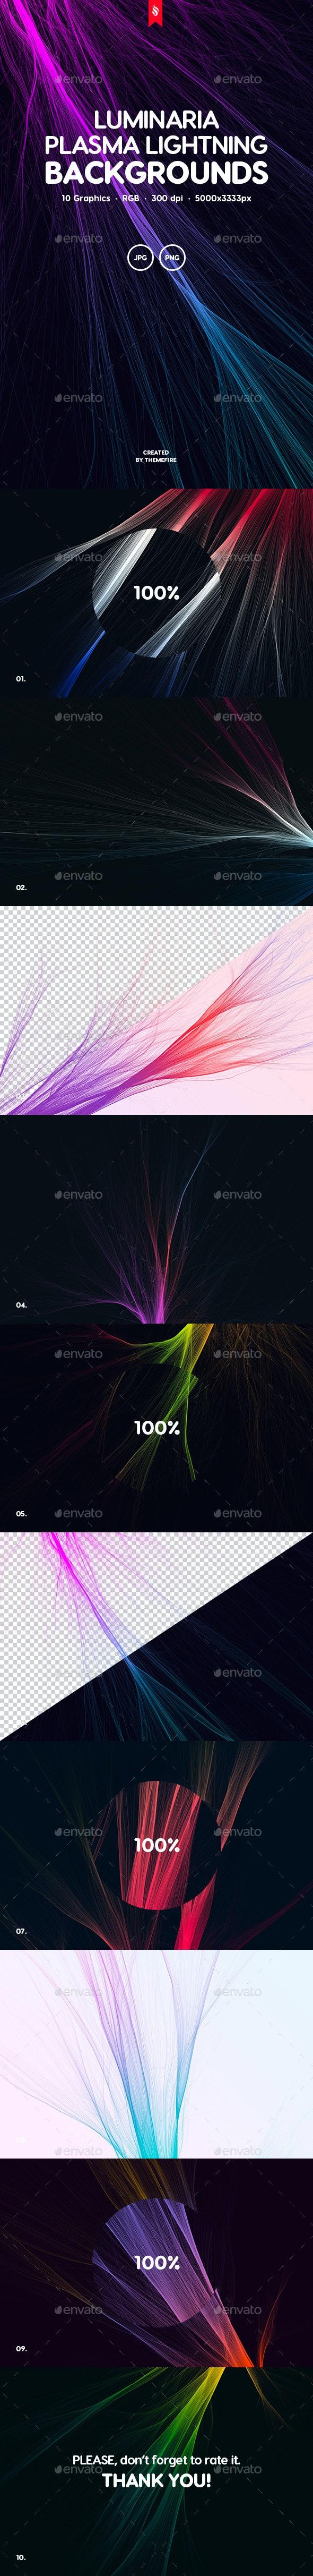 Luminaria - Plasma Lightning Background Set - Tech / Futuristic Backgrounds